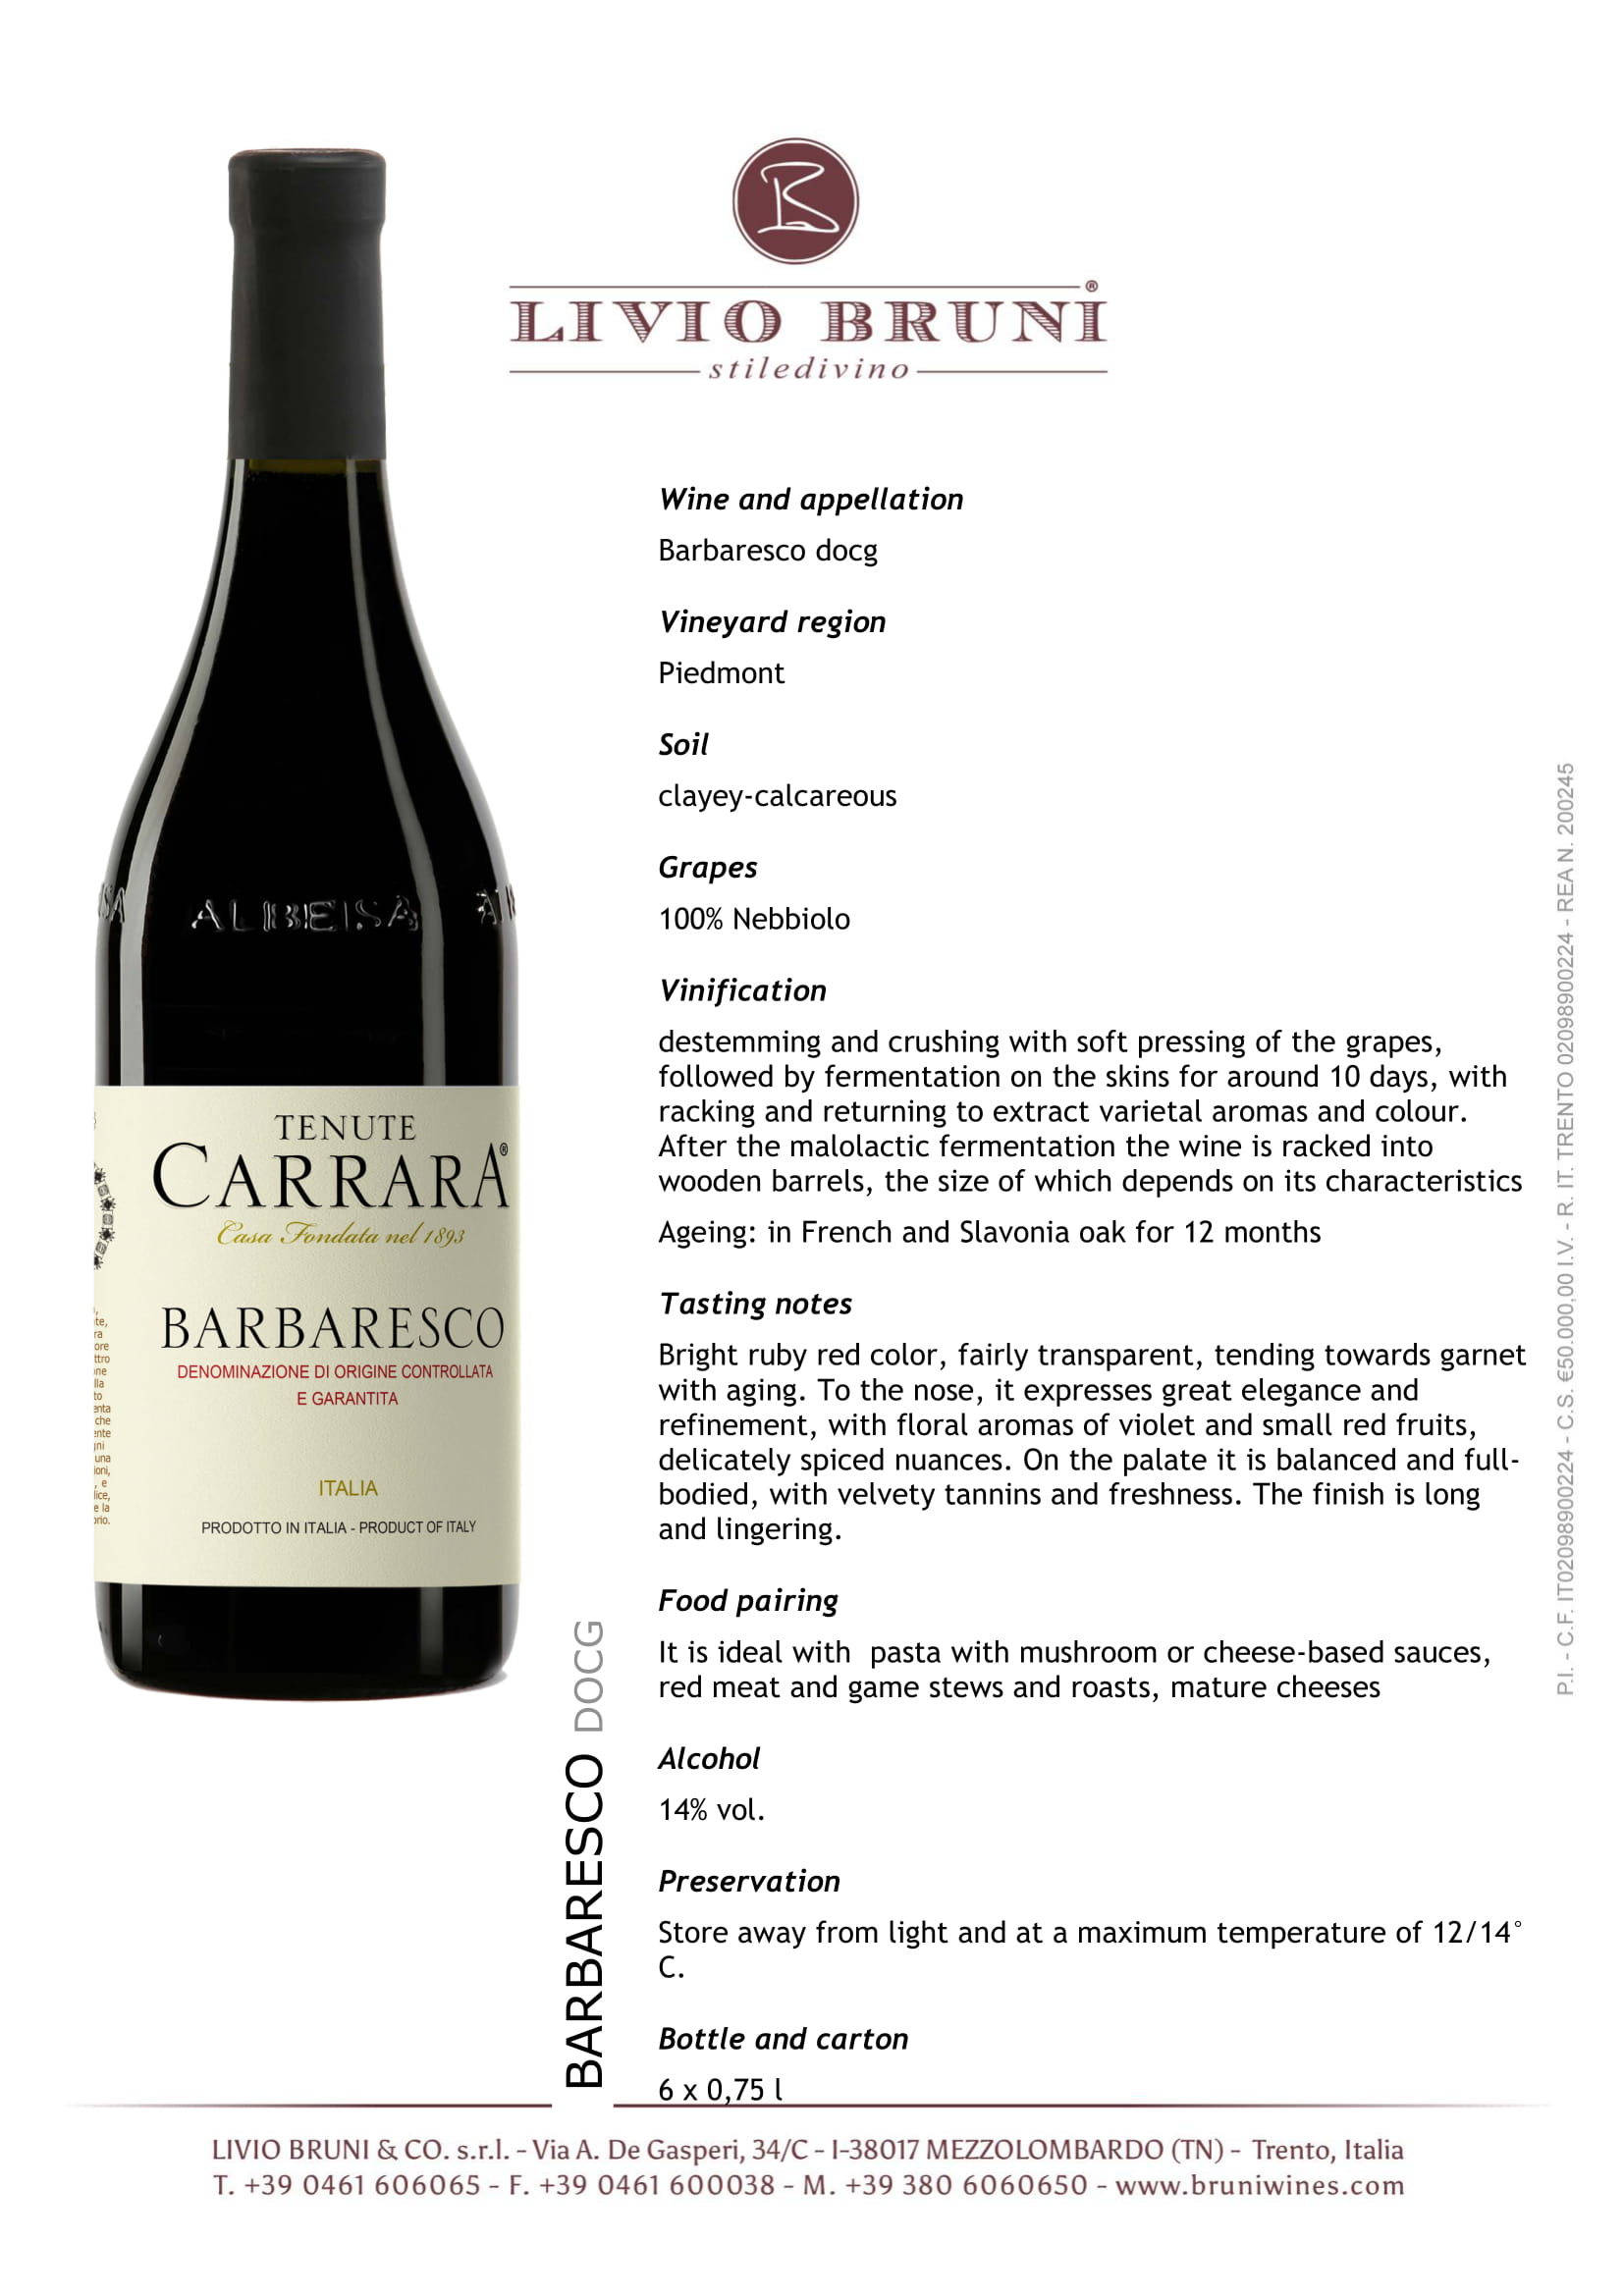 Tenute Carrara Barbaresco Tech Sheet